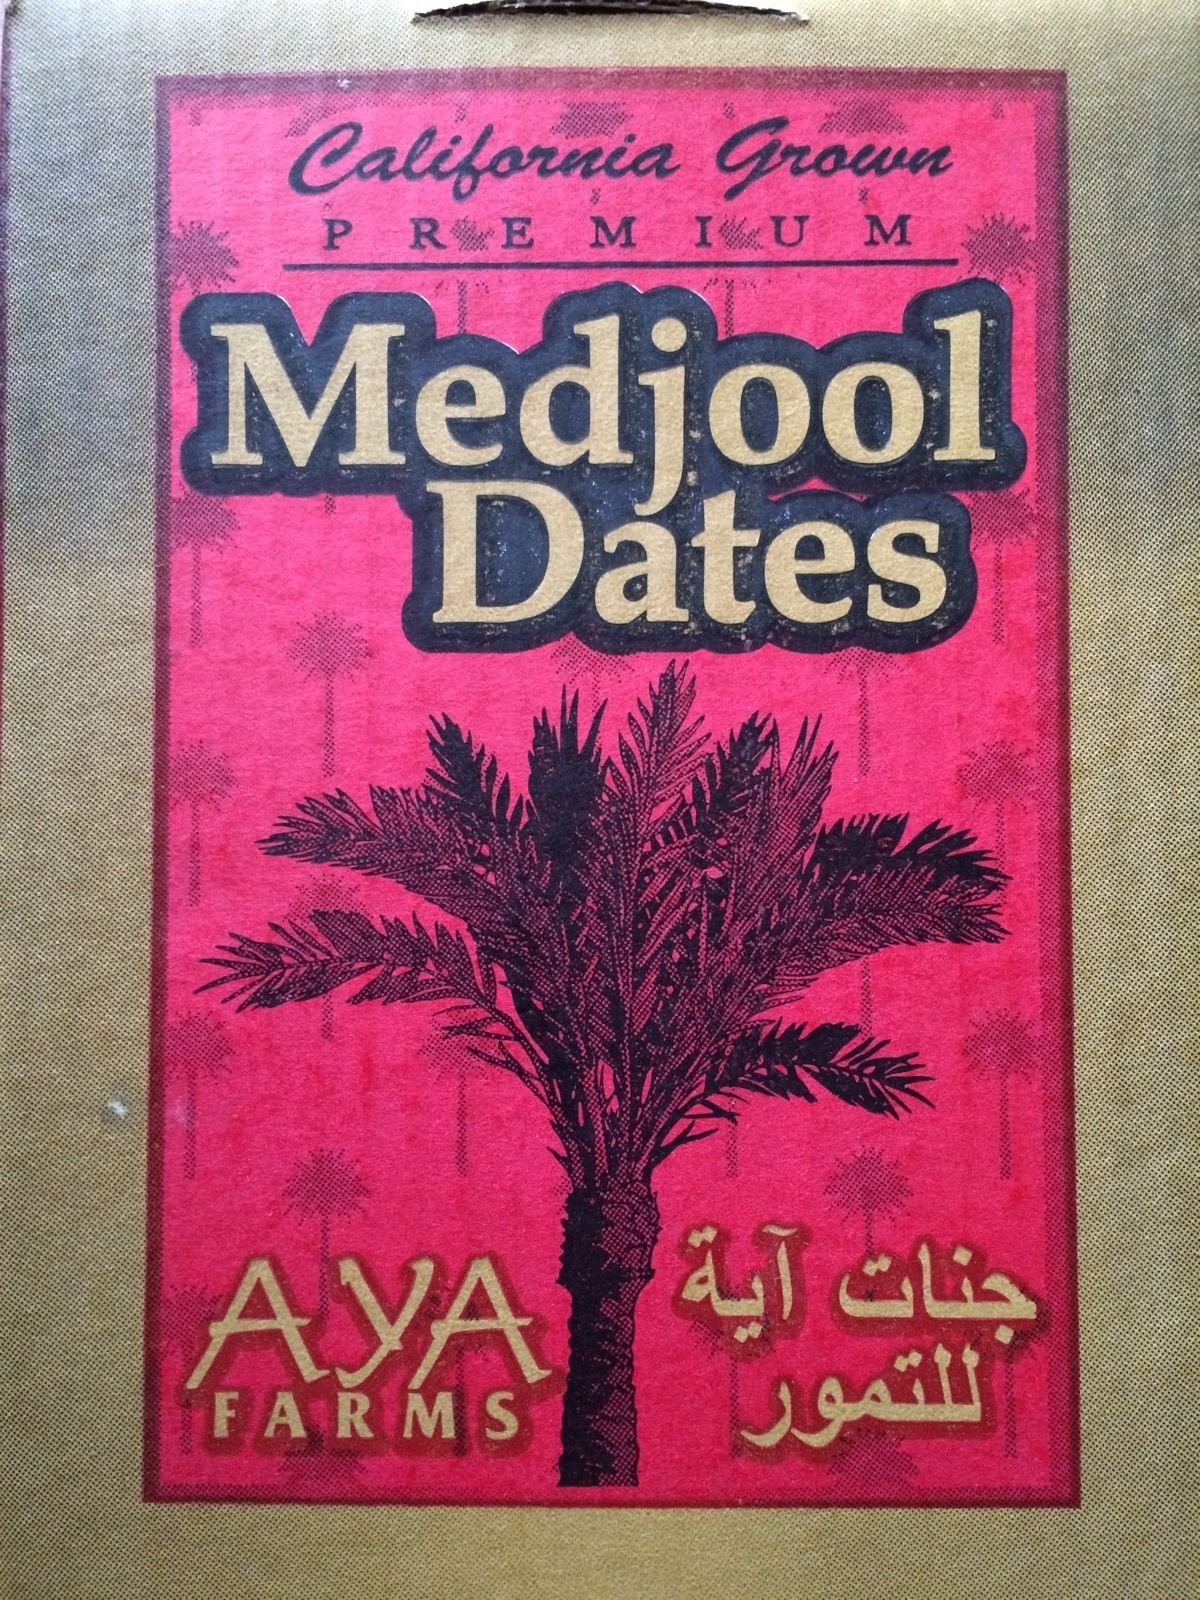 Medjool Dates, Fresh, Soft, Sweet, fom Aya Farms, 2 lb, تمر مدجول